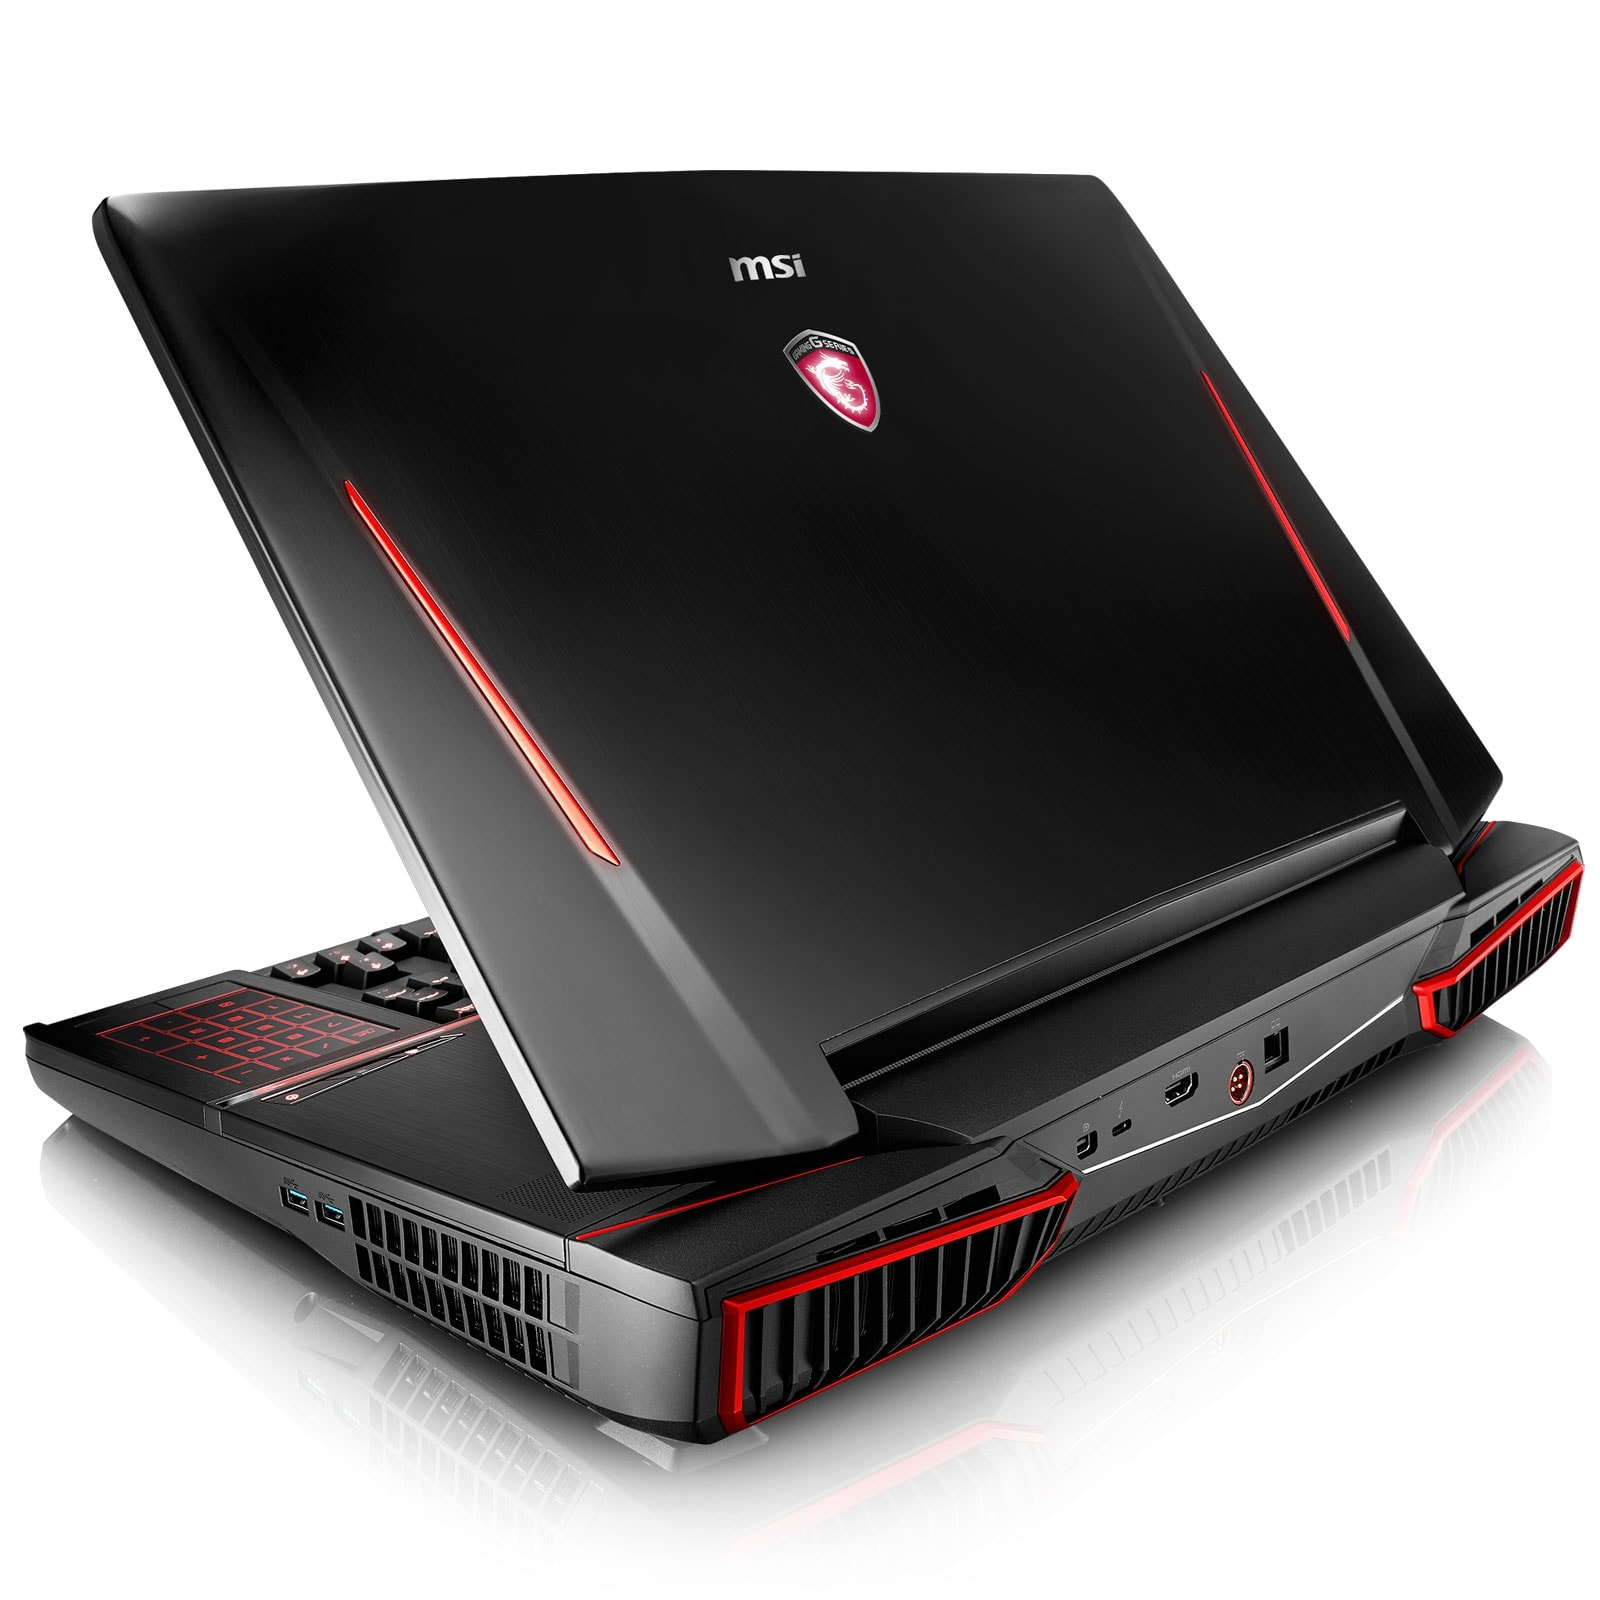 MSI GT83VR 6RF (Titan SLI)-037FR  (9S7-181512-037) - Achat / Vente PC portable sur Cybertek.fr - 3